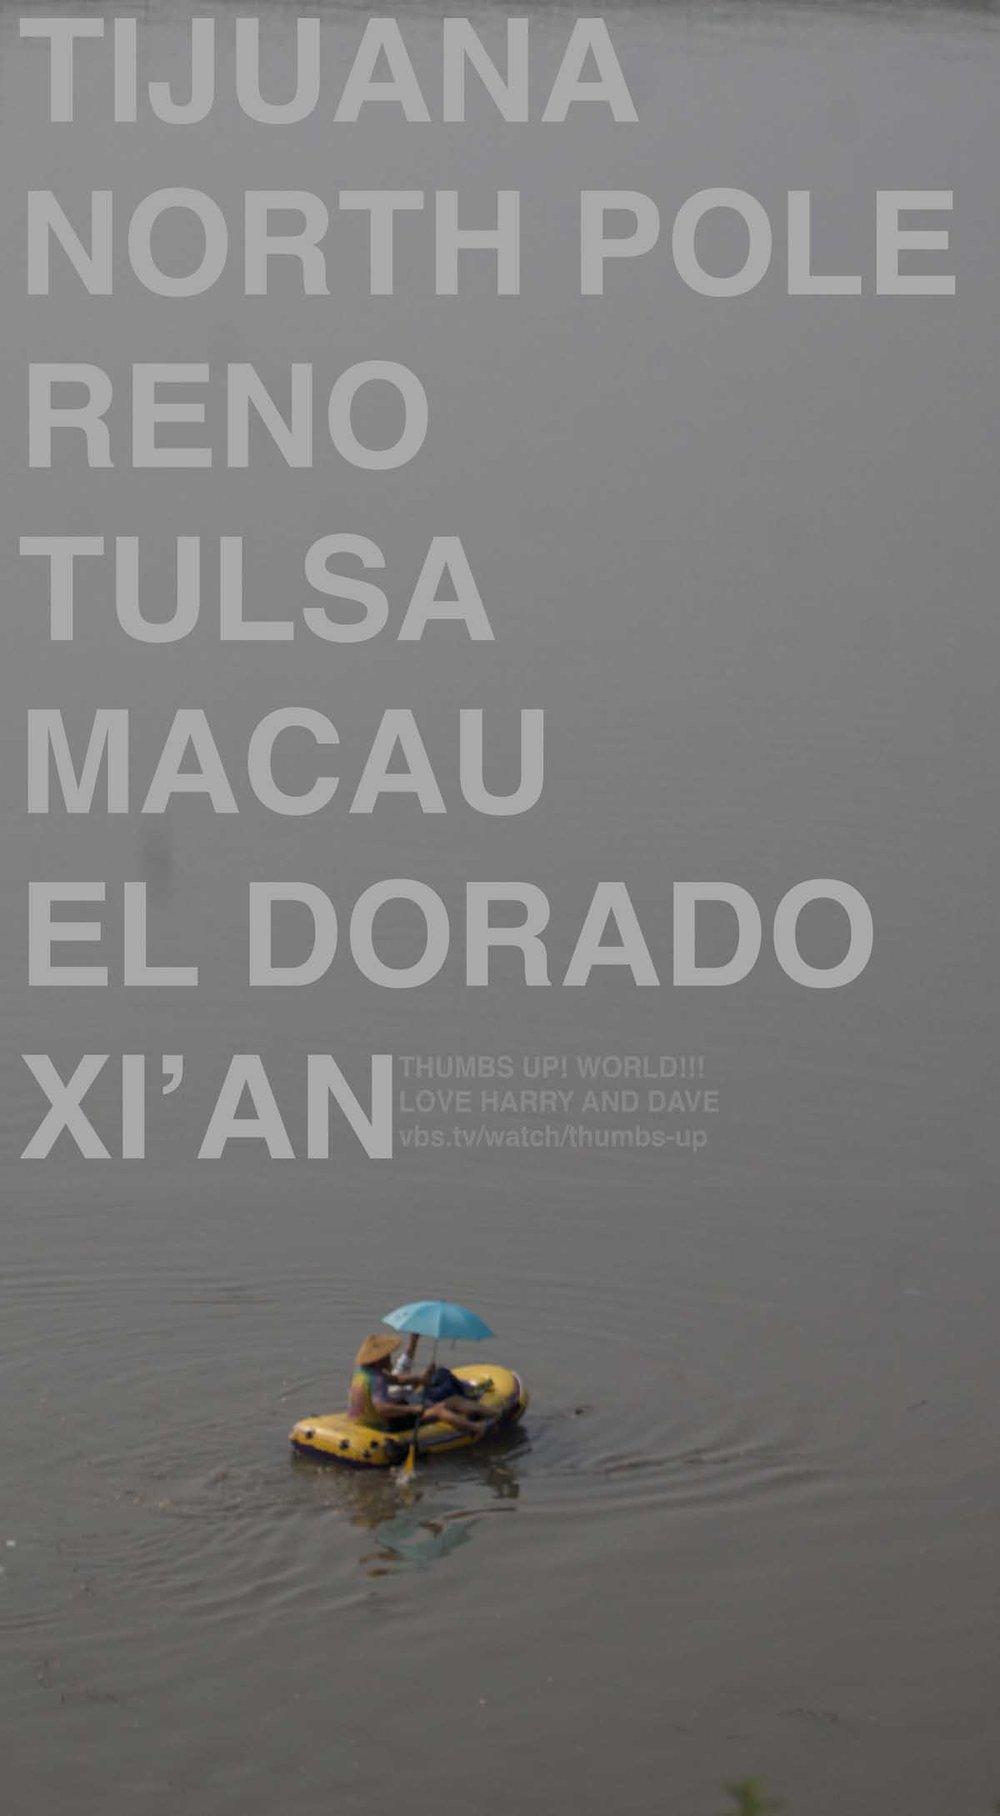 Thumbs Up! hitchhiking show poster - floating raft - Tijuana, North Pole, Reno, Tulsa, Macau, El Dorado, Xi'an